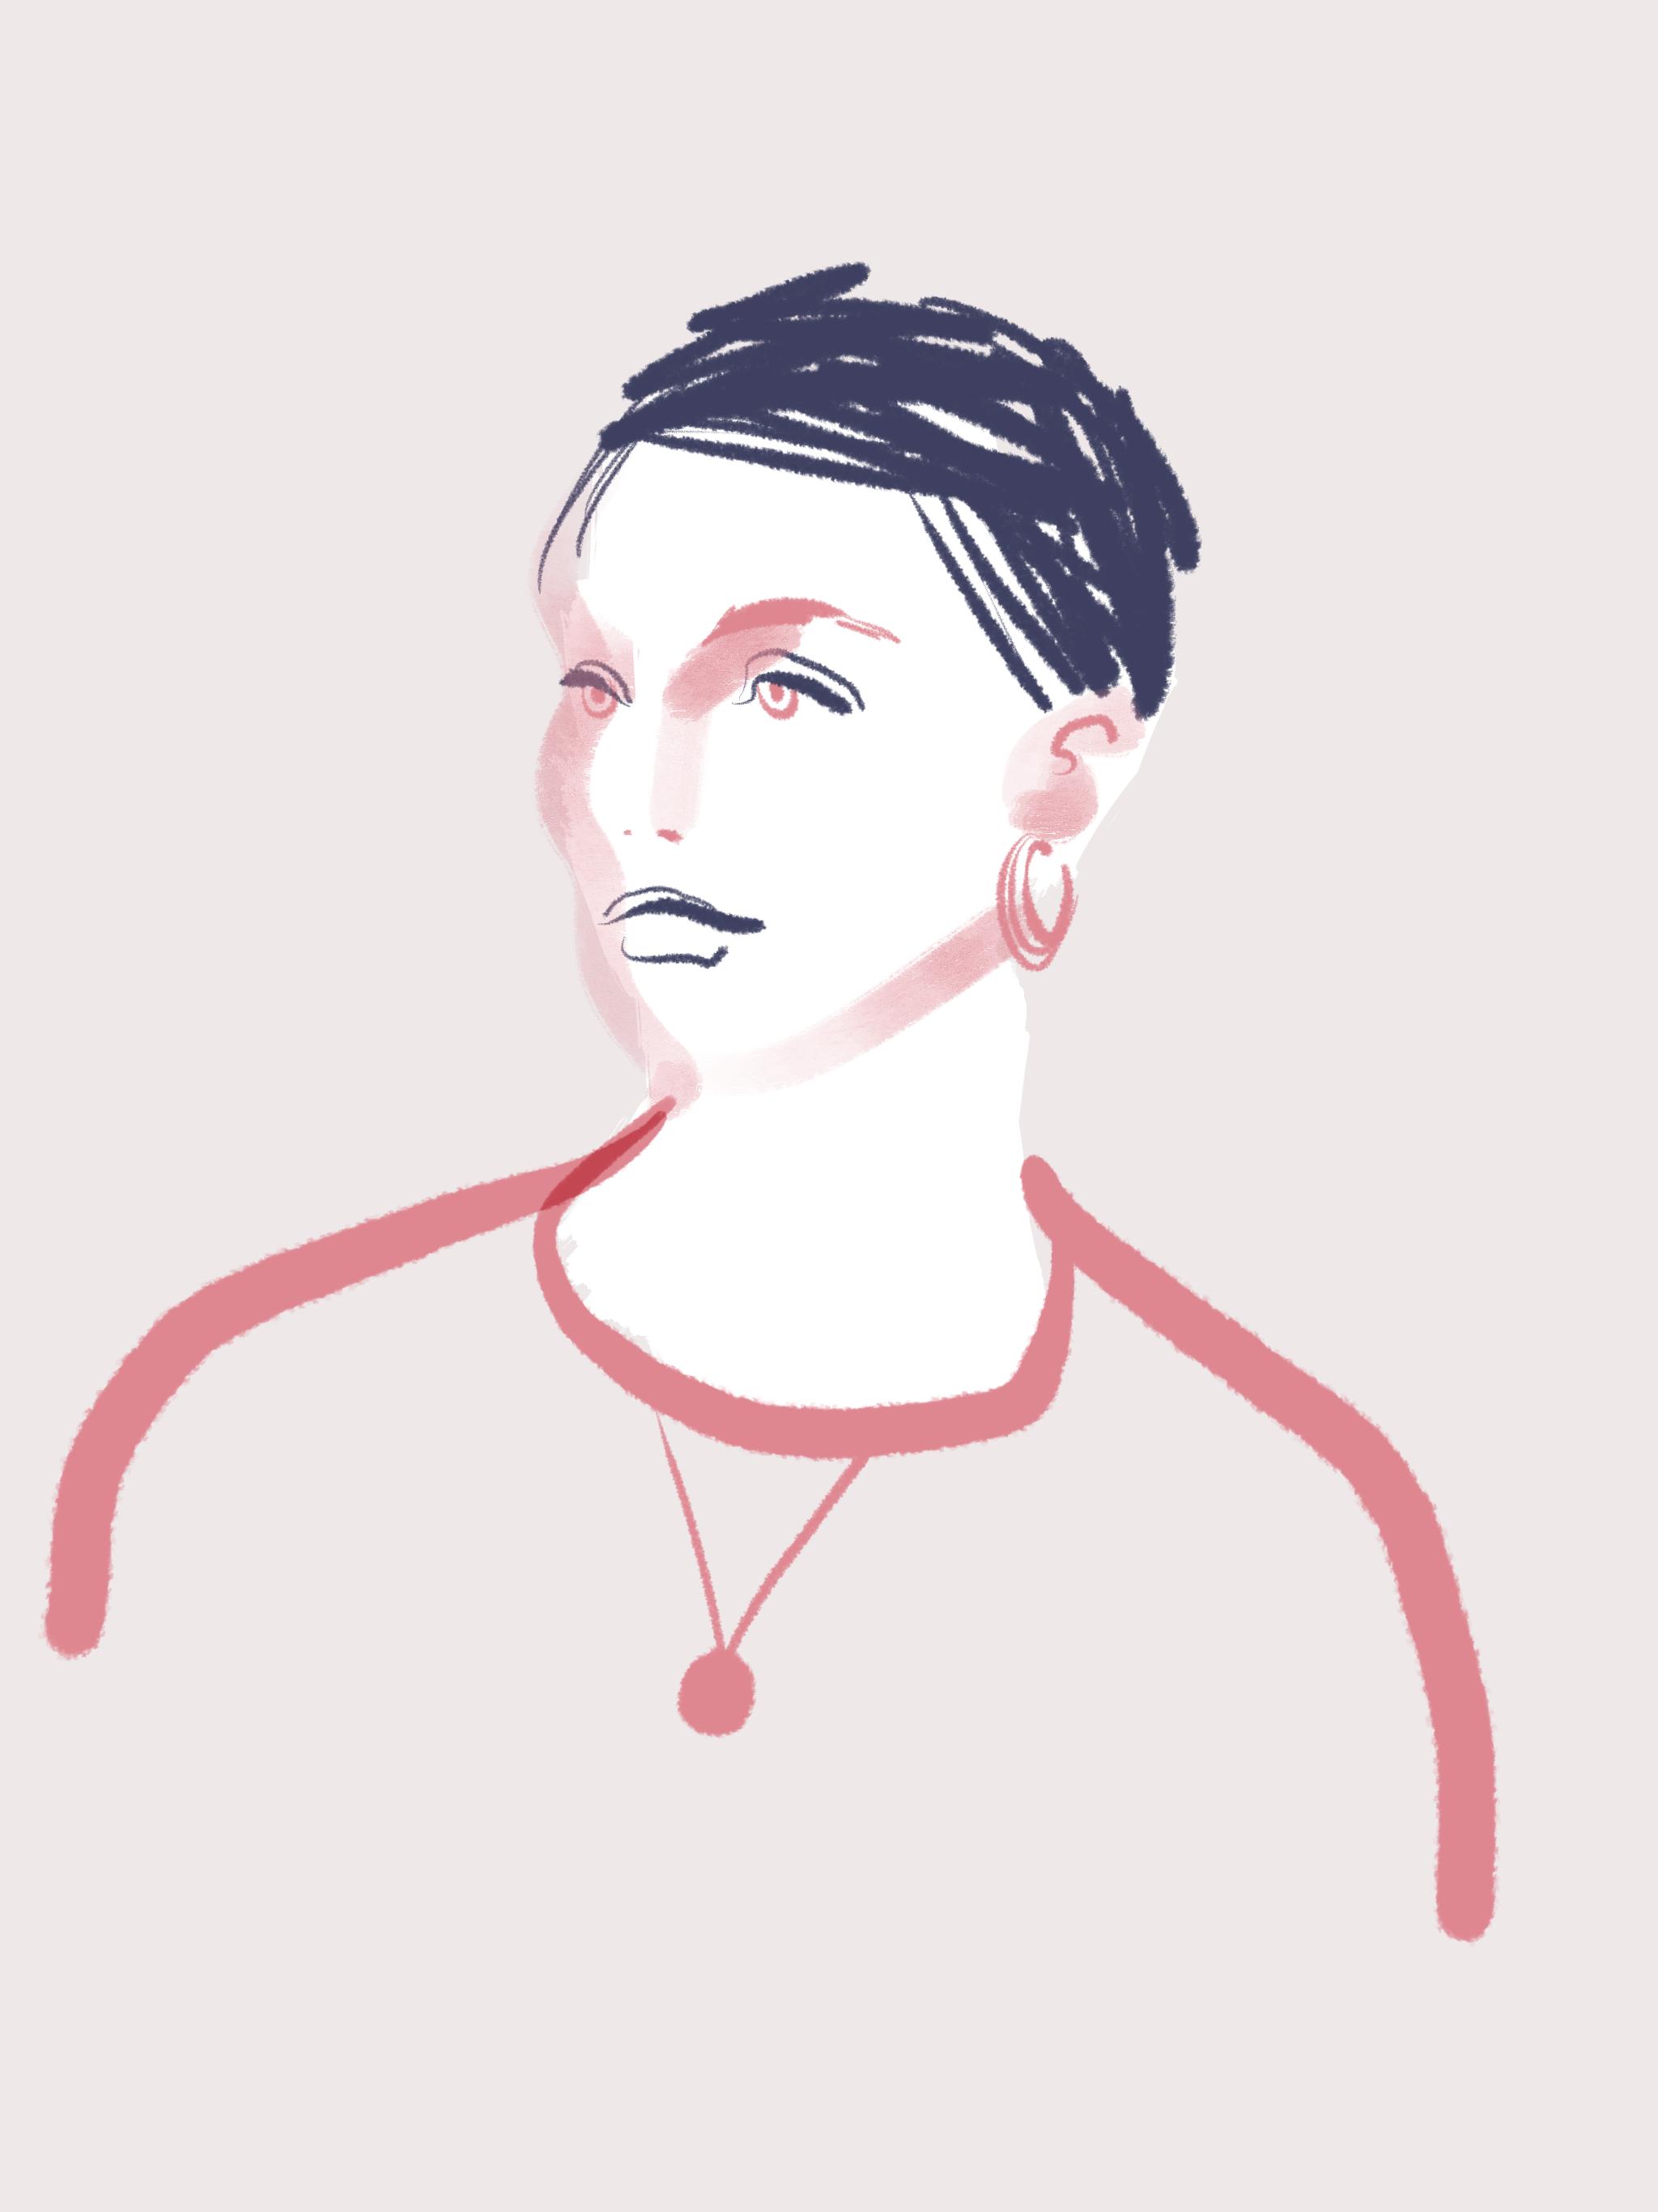 Pixie Cut - Beauty Illustration by Silvana Mariani